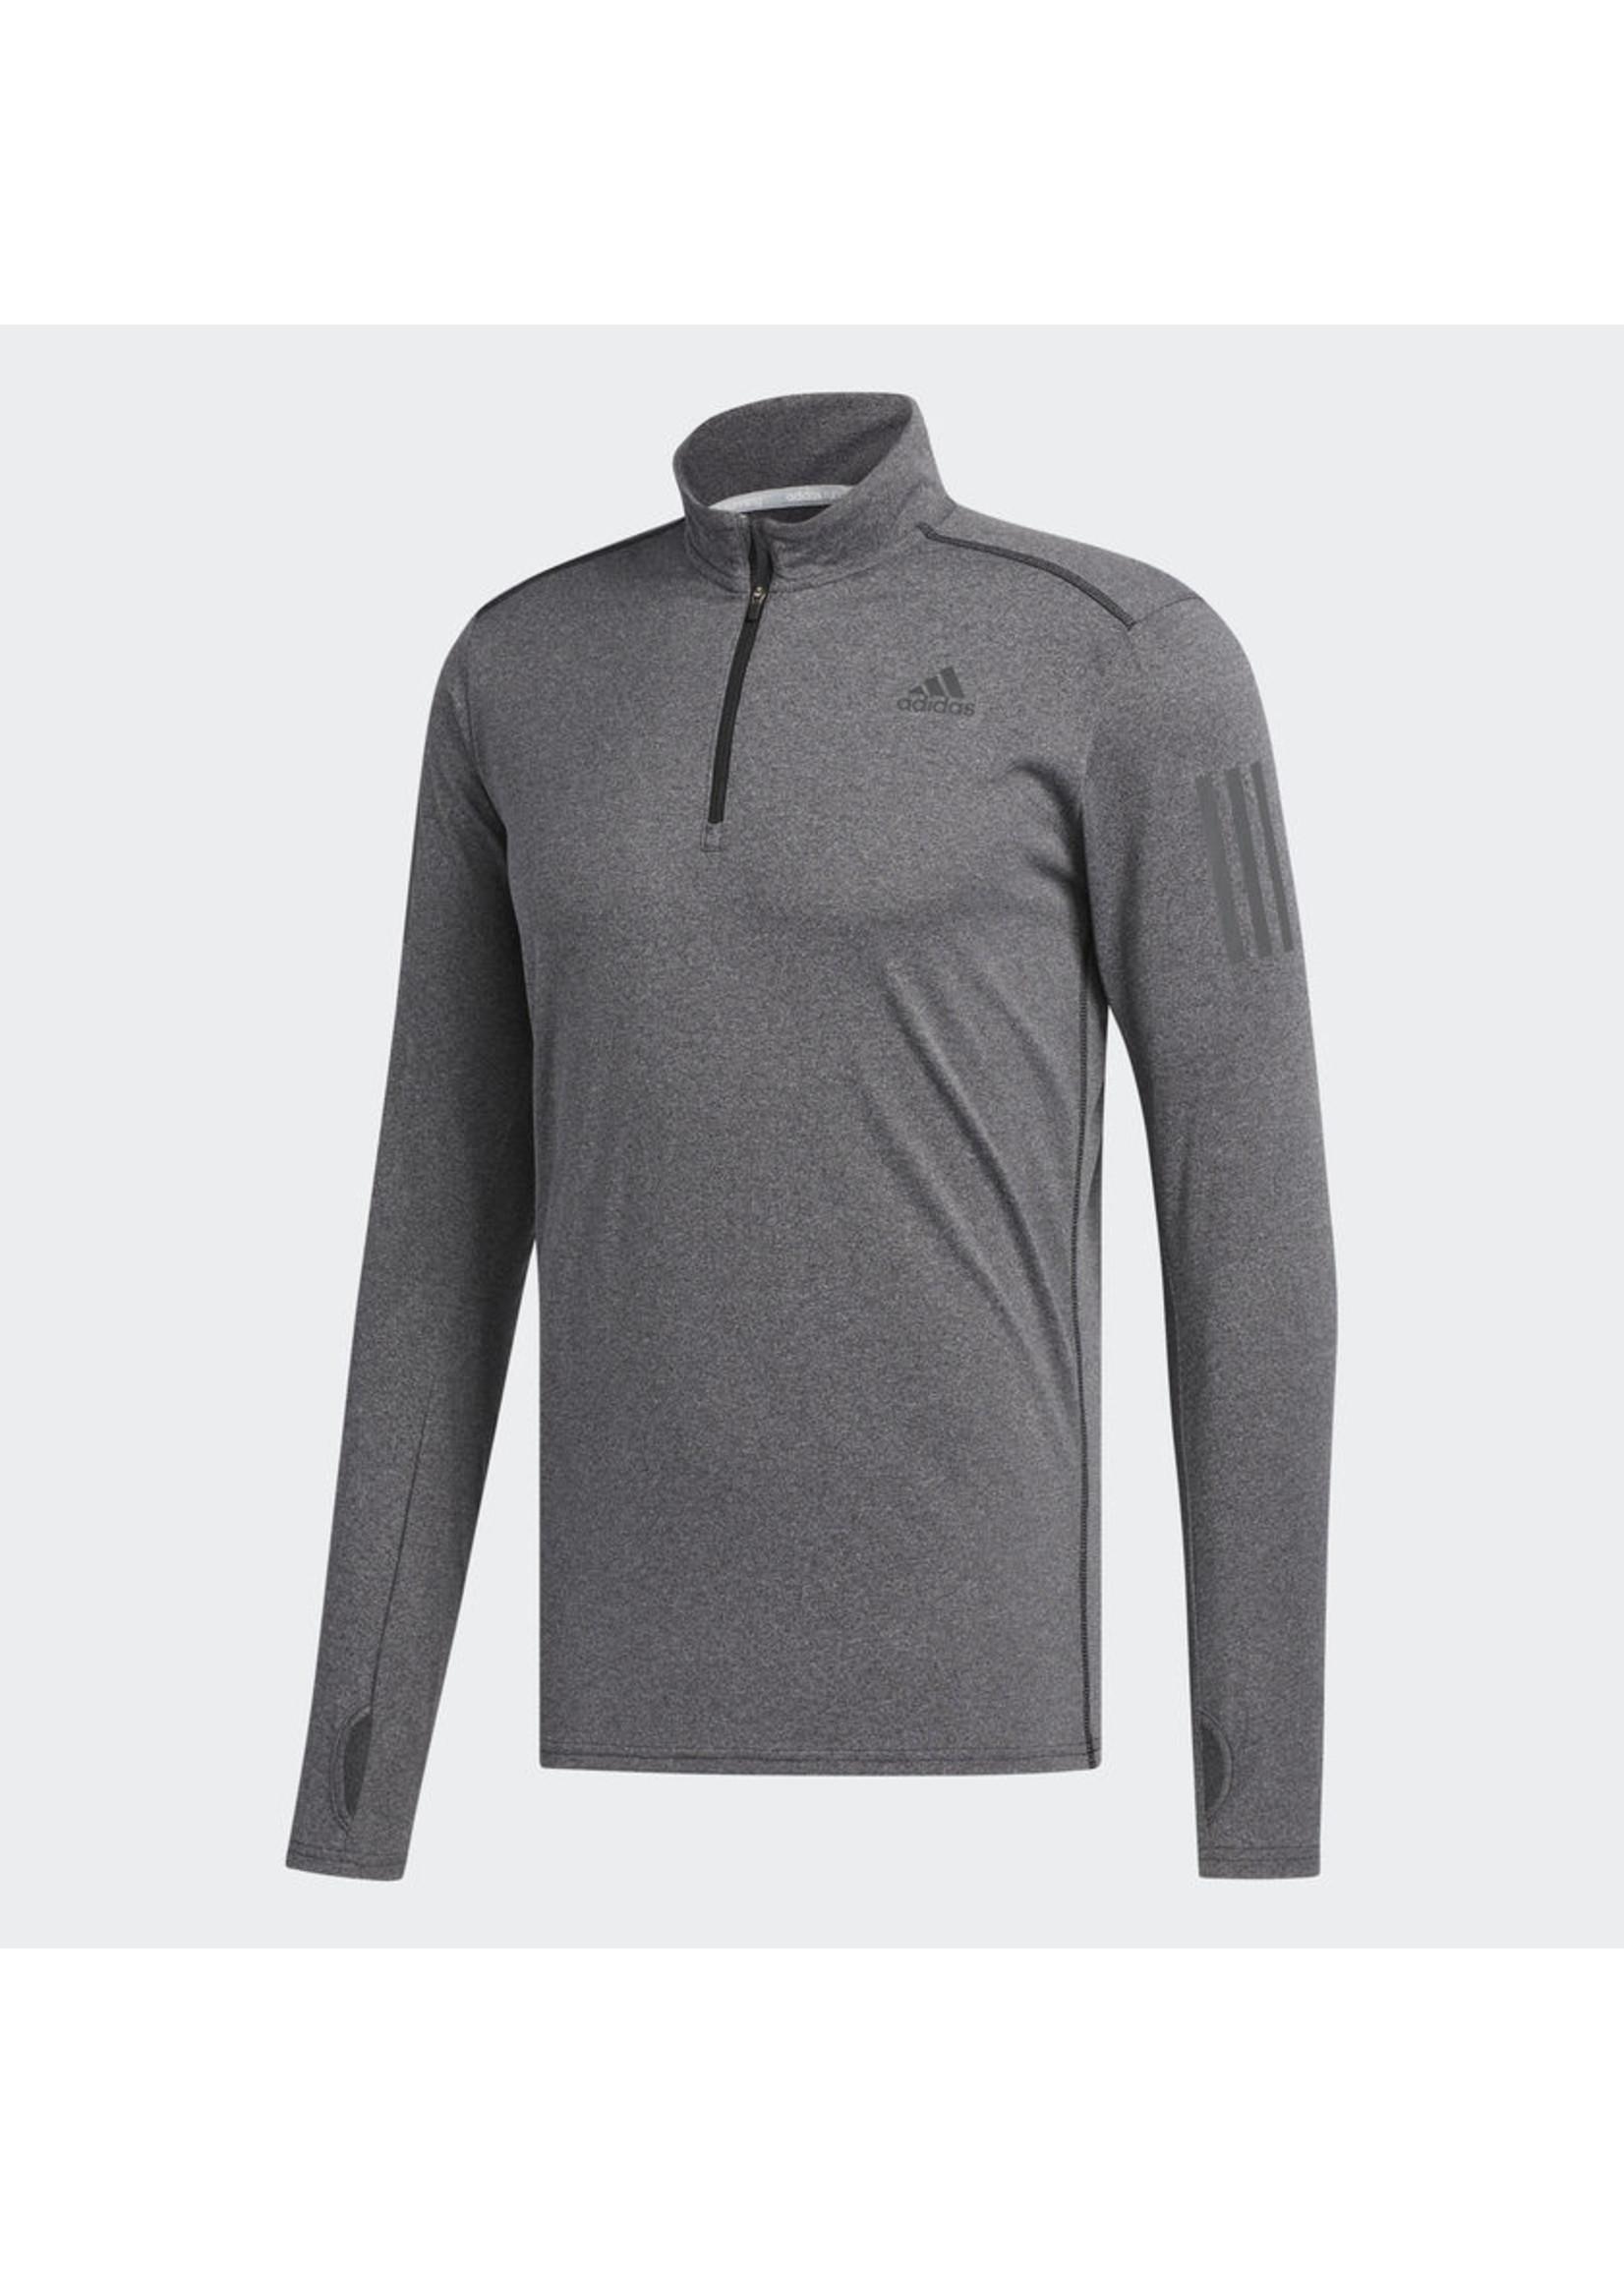 Adidas Adidas Mens Response LS Zip Tee (2018)